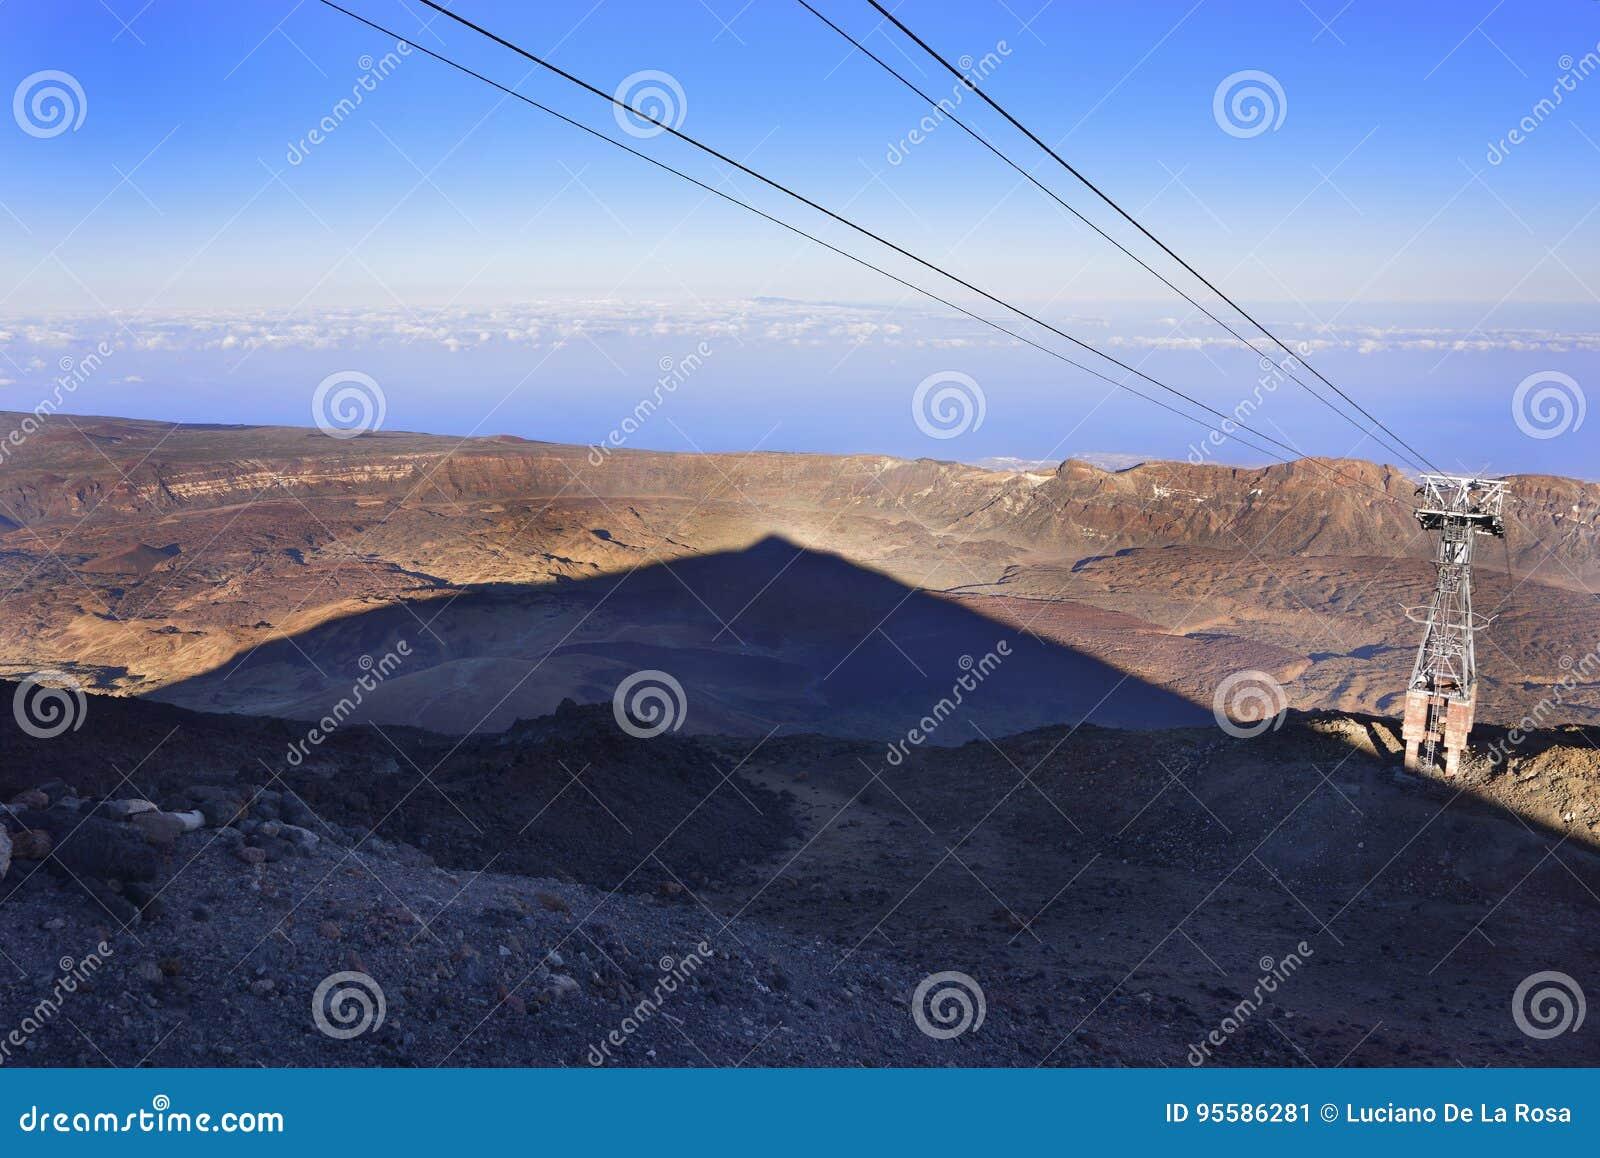 Volcano Teide, Tenerife 3718 metri Patrimonio naturale di UNESC